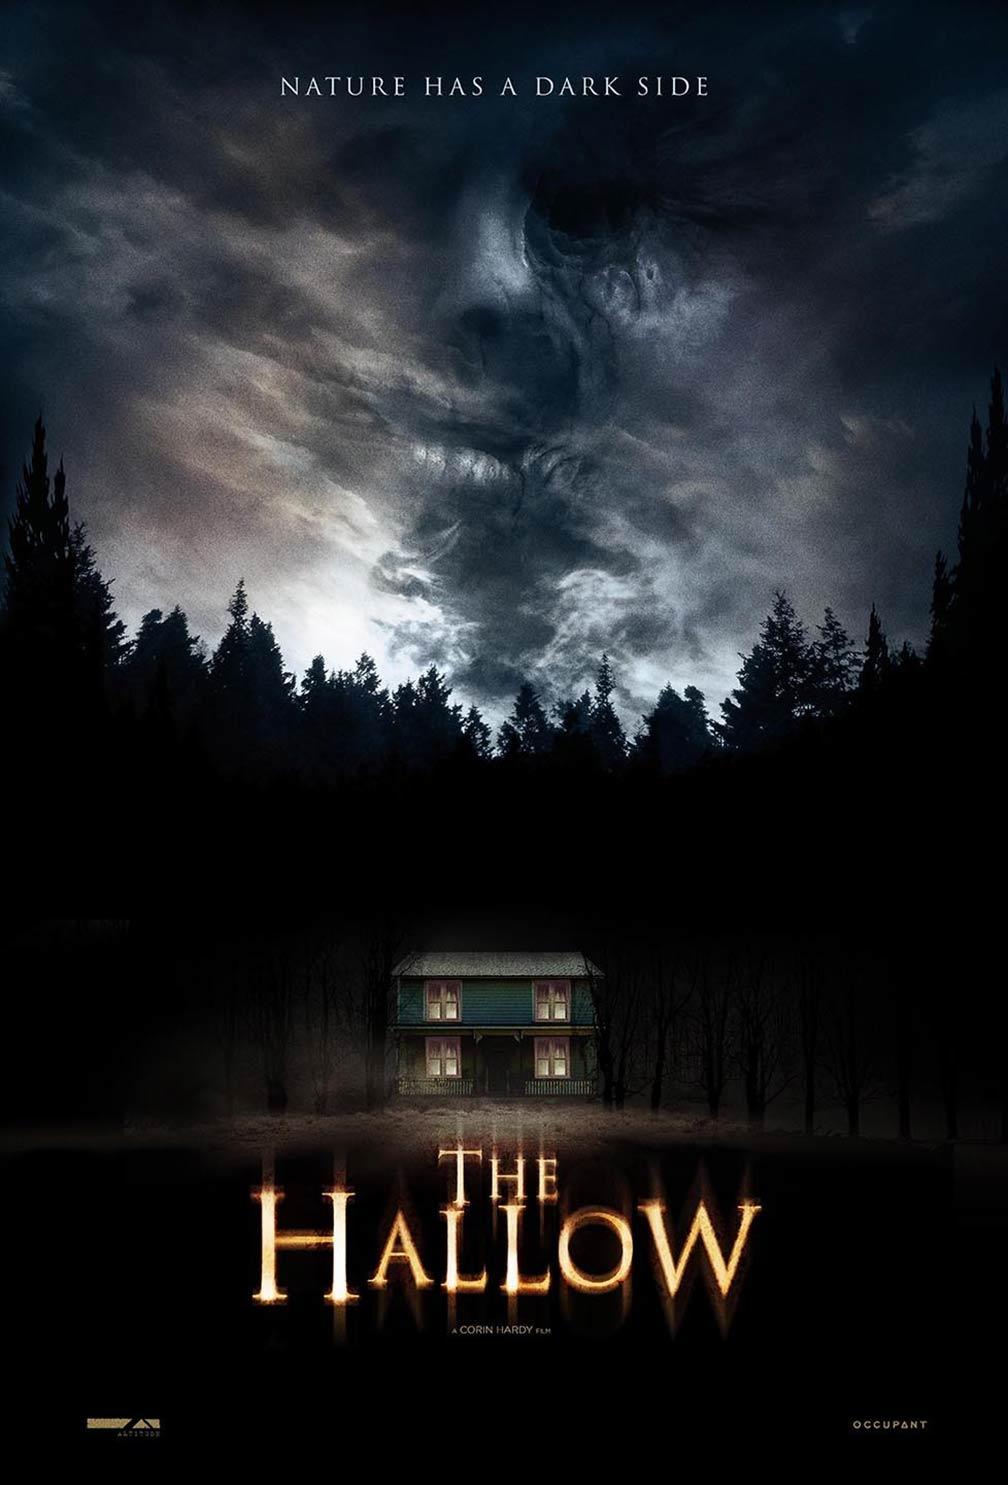 the hallow (2015)dvdplanetstorepk